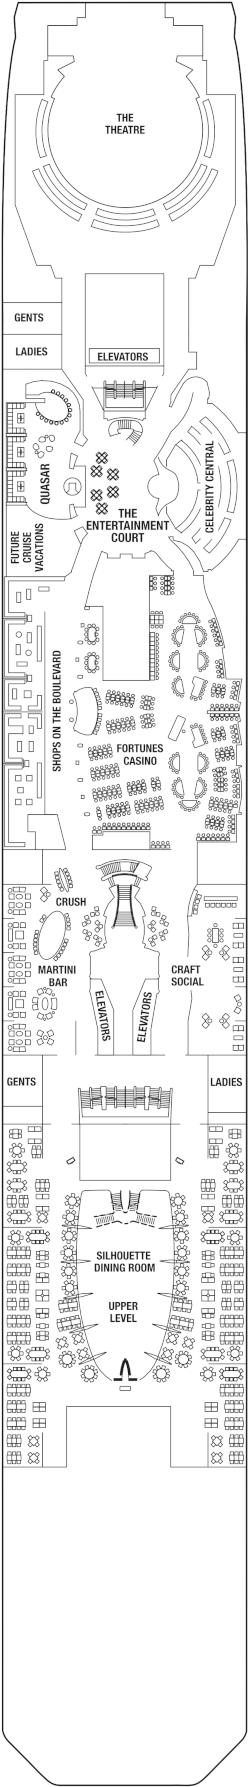 Celebrity Equinox Deck 4 Deck Plan